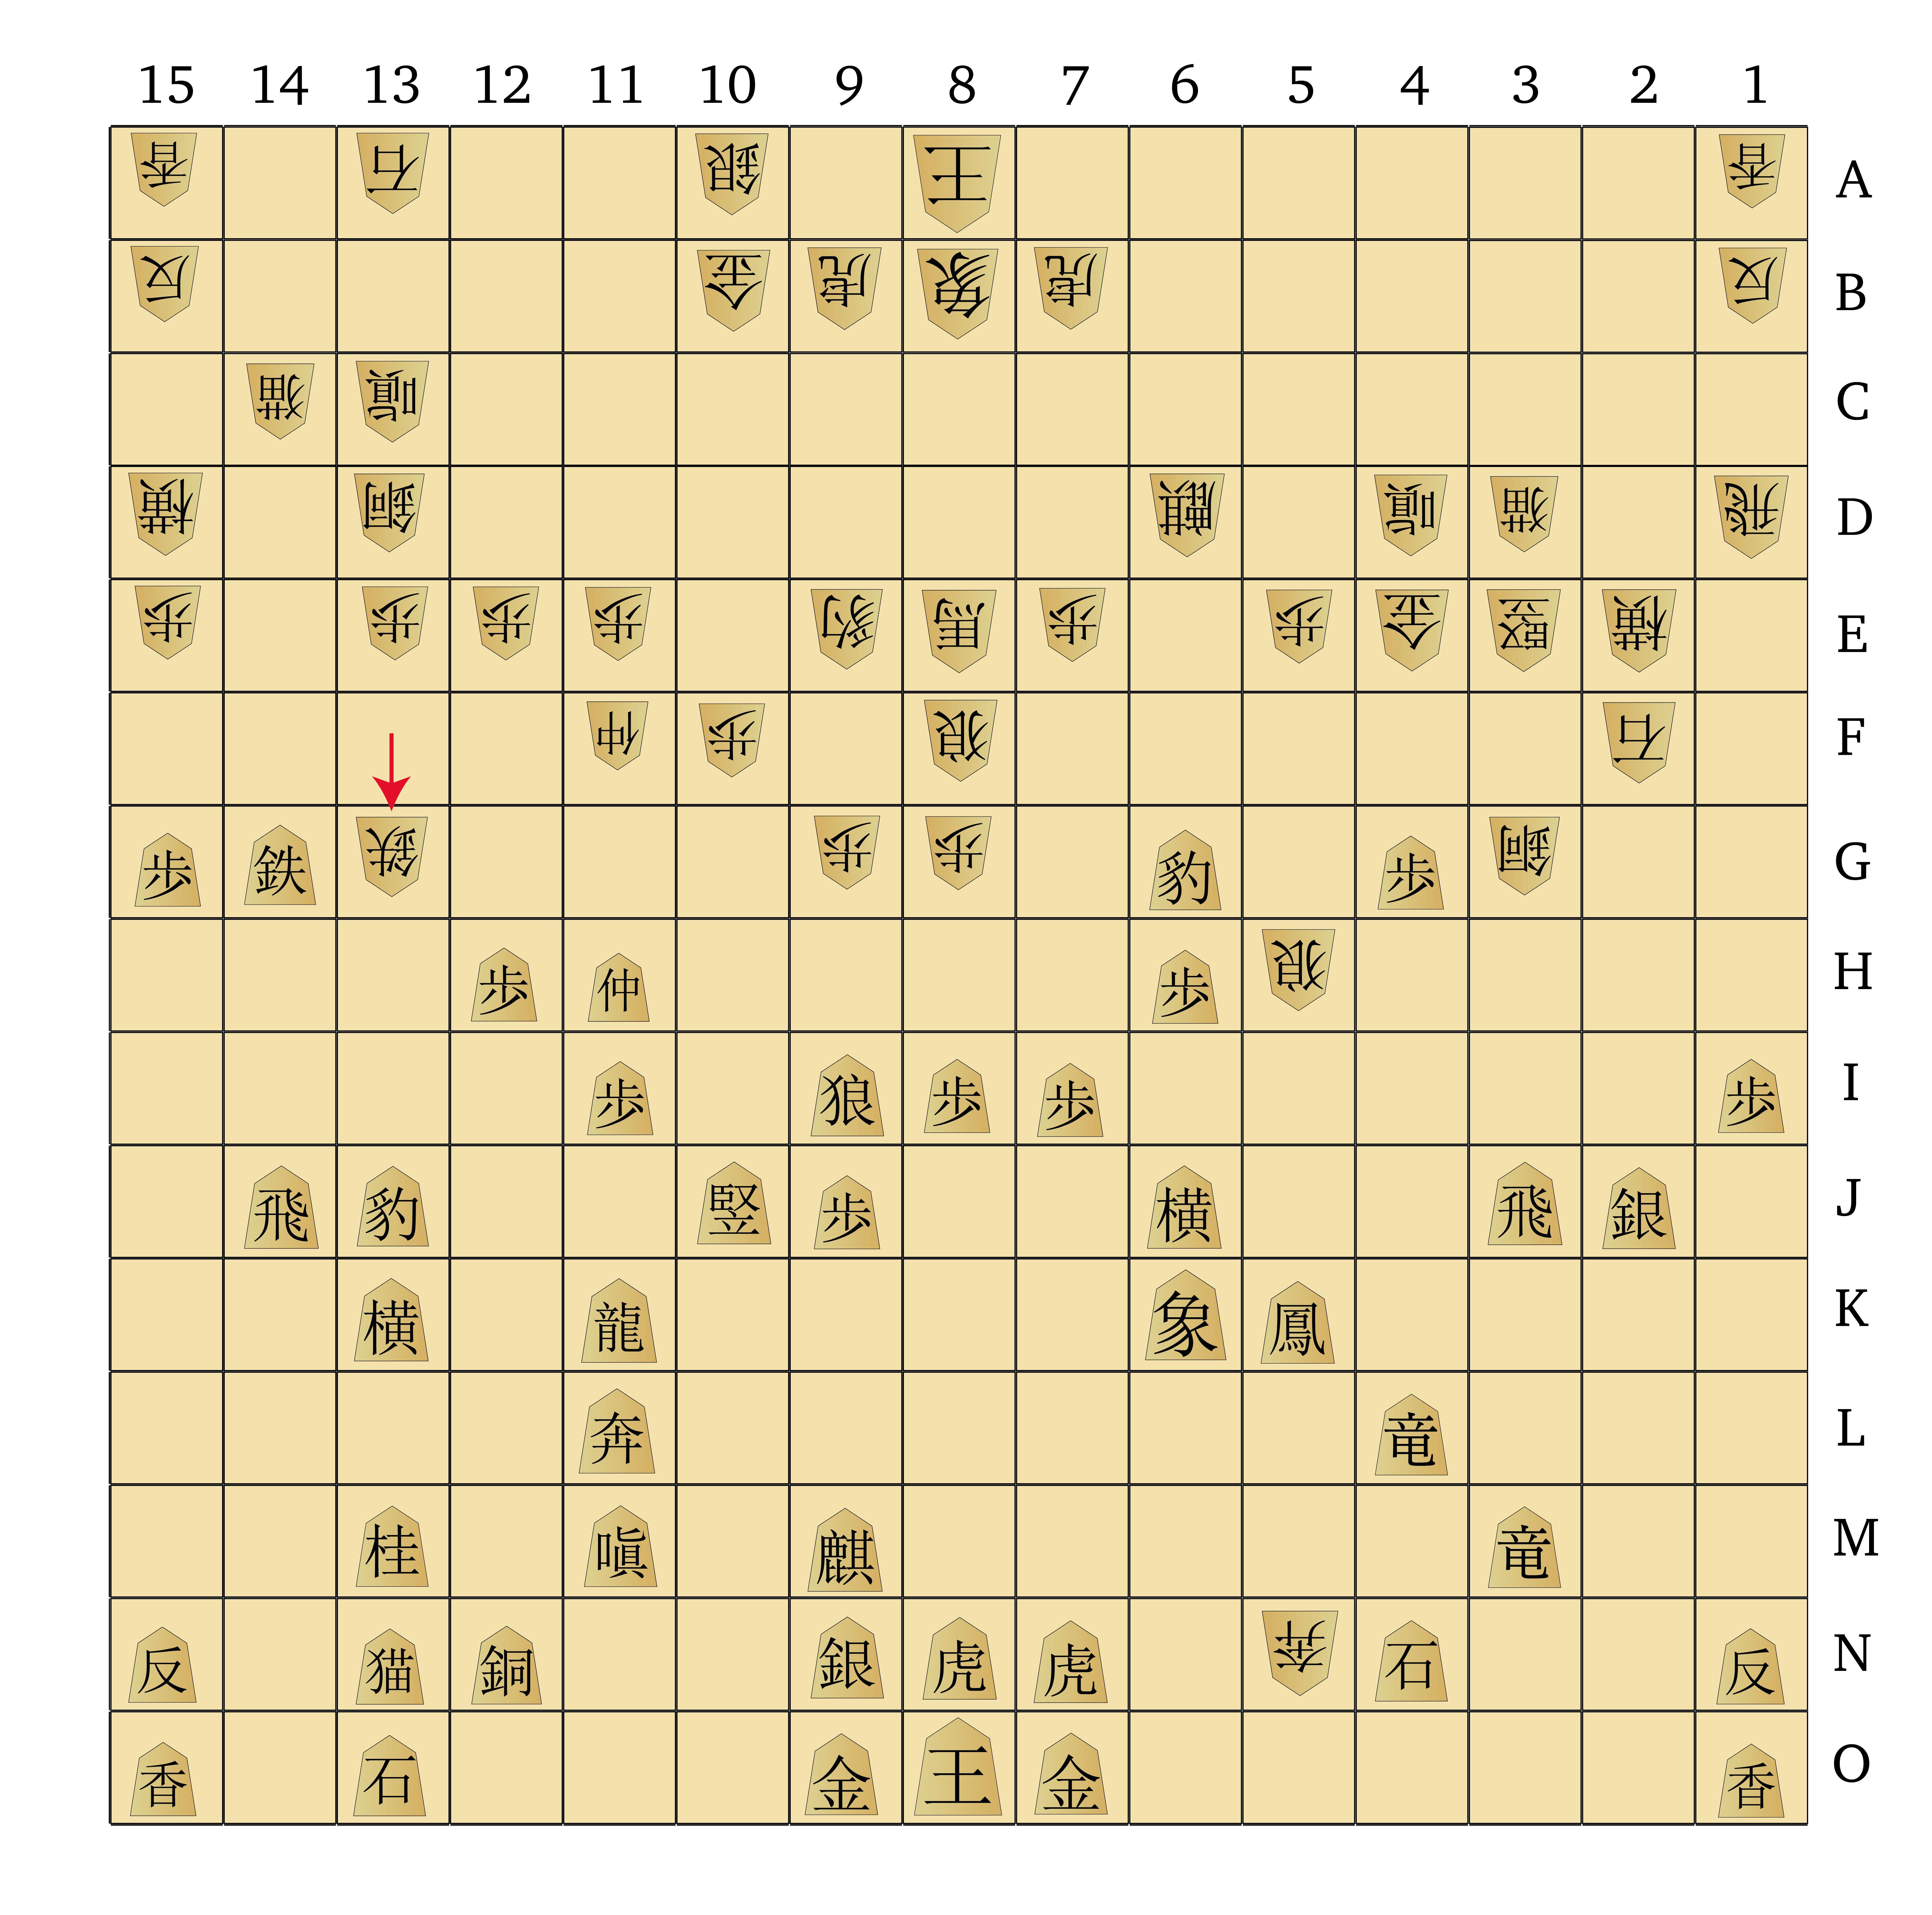 Dai Shogi 420 -- Move 330-01